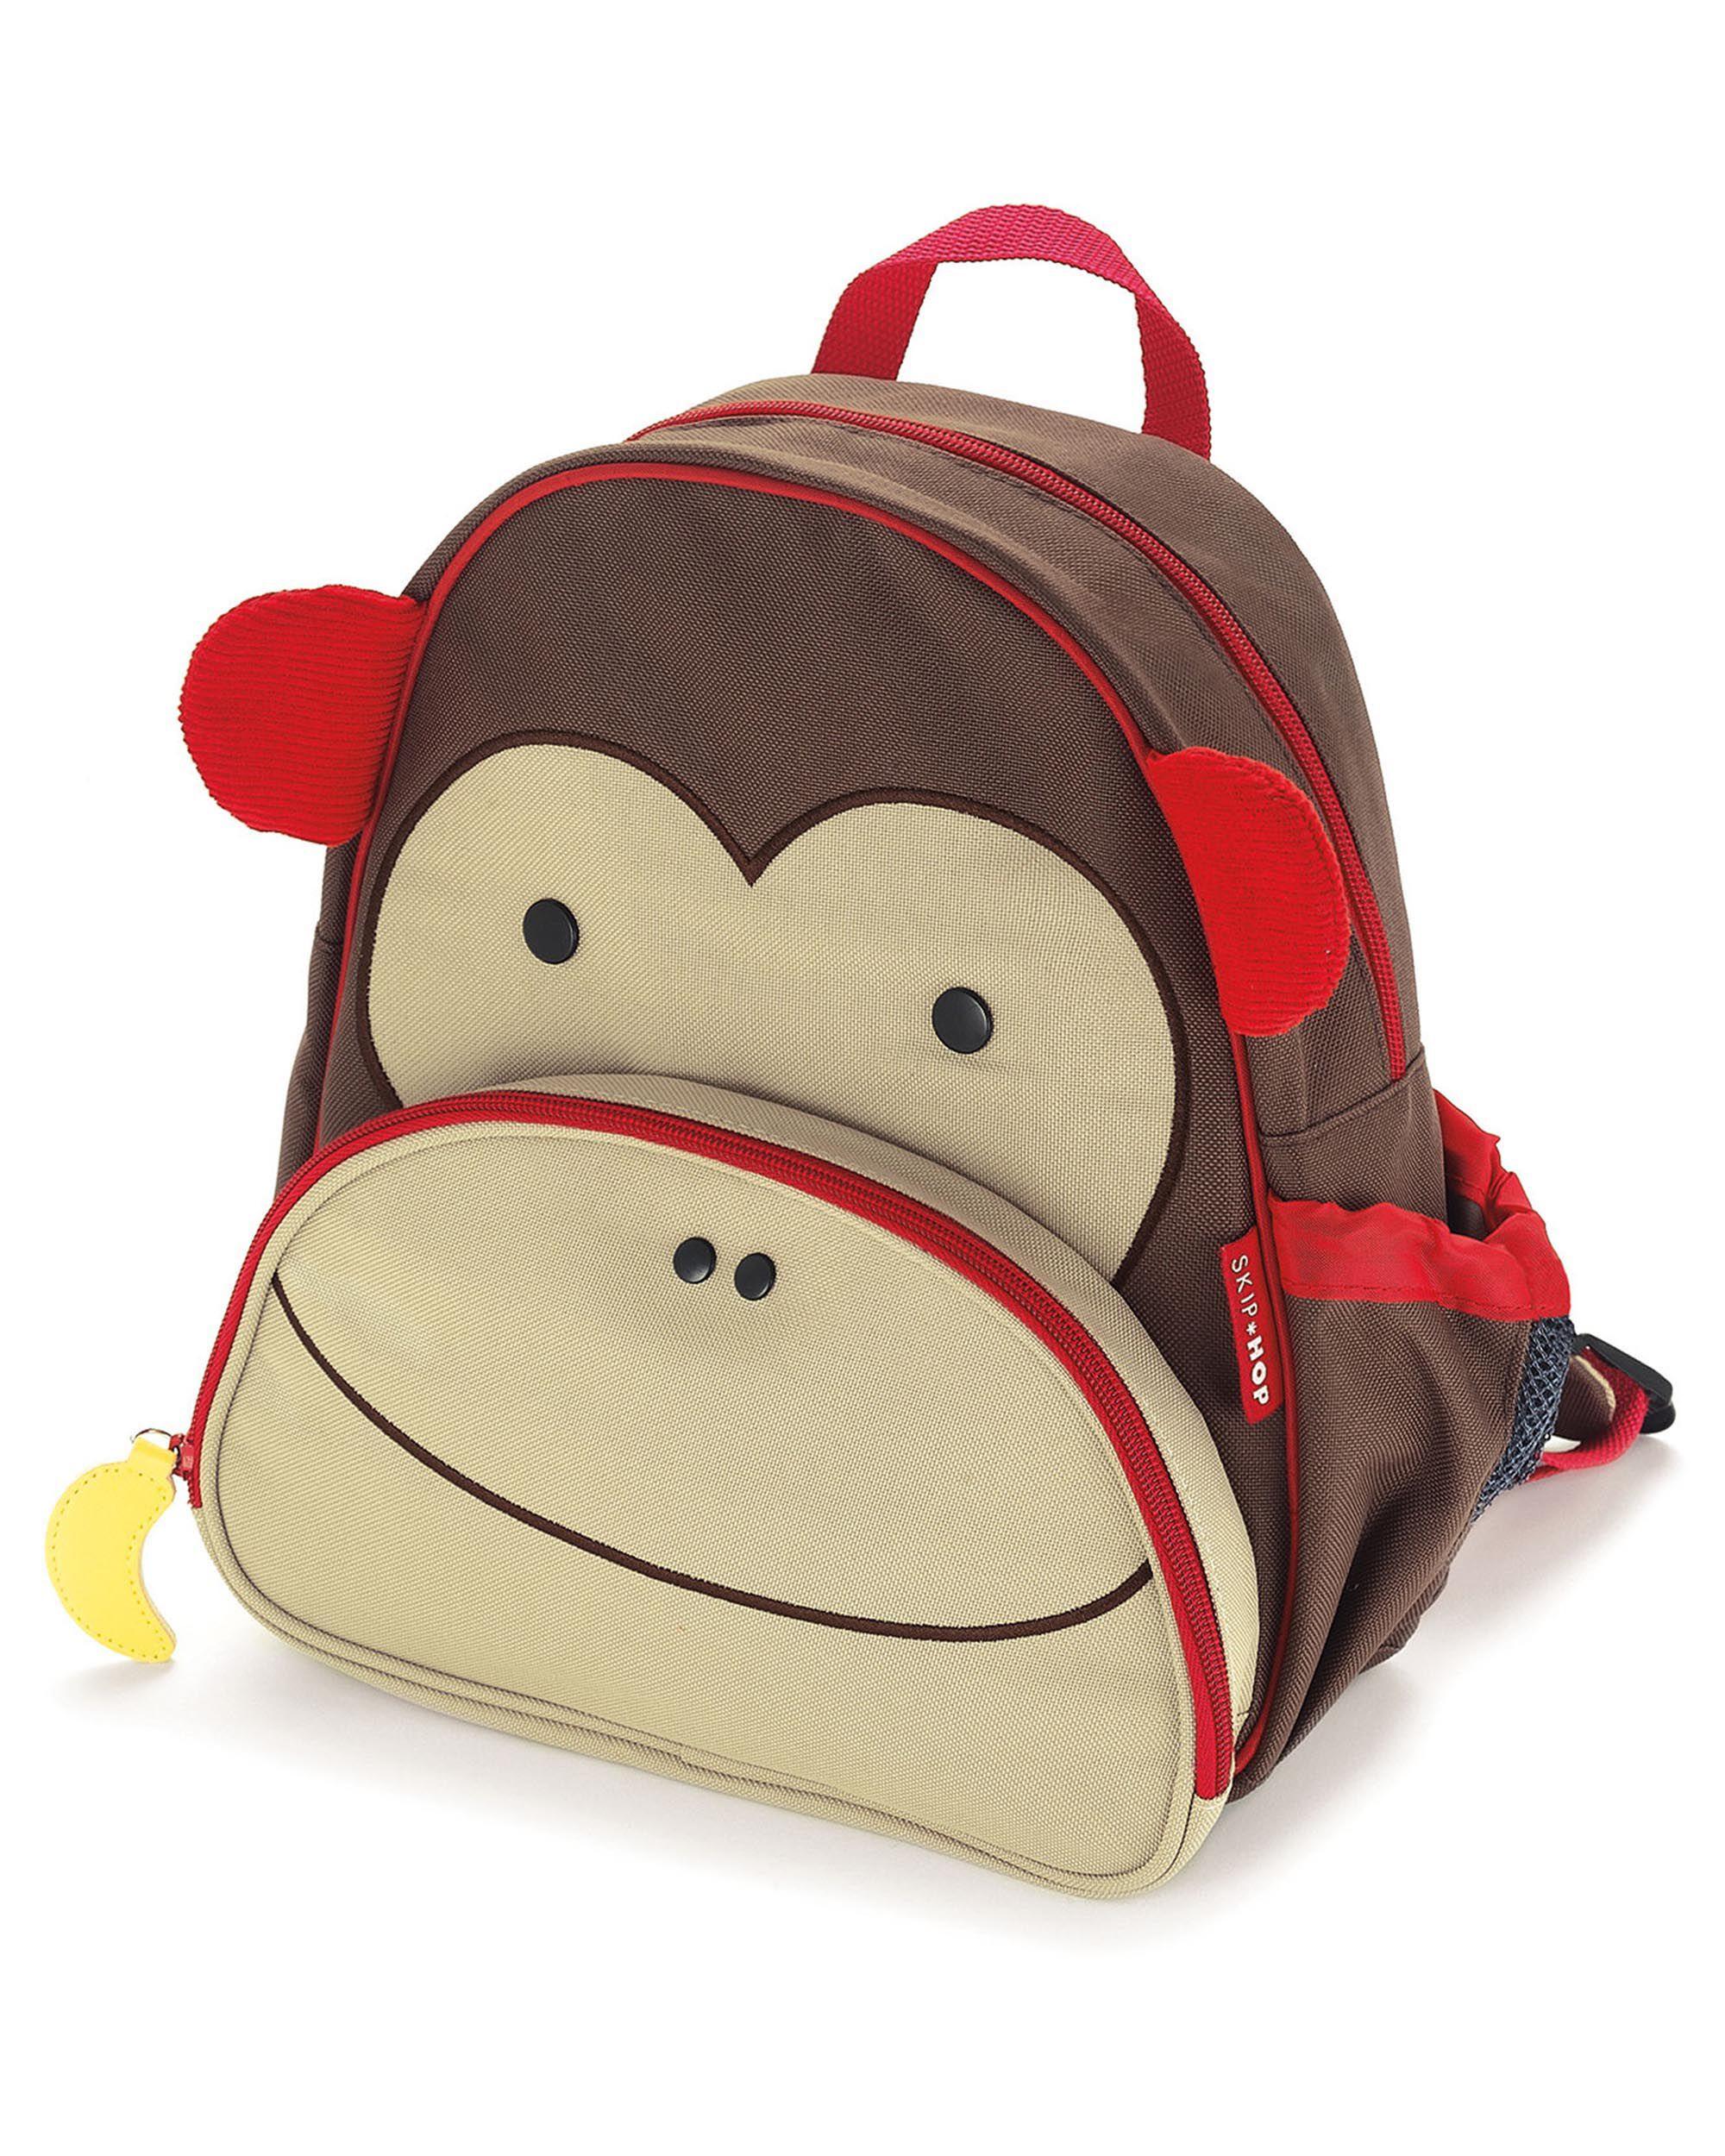 Lovely Zoo Animal Cute Raccoon Toddler Kid Backpack